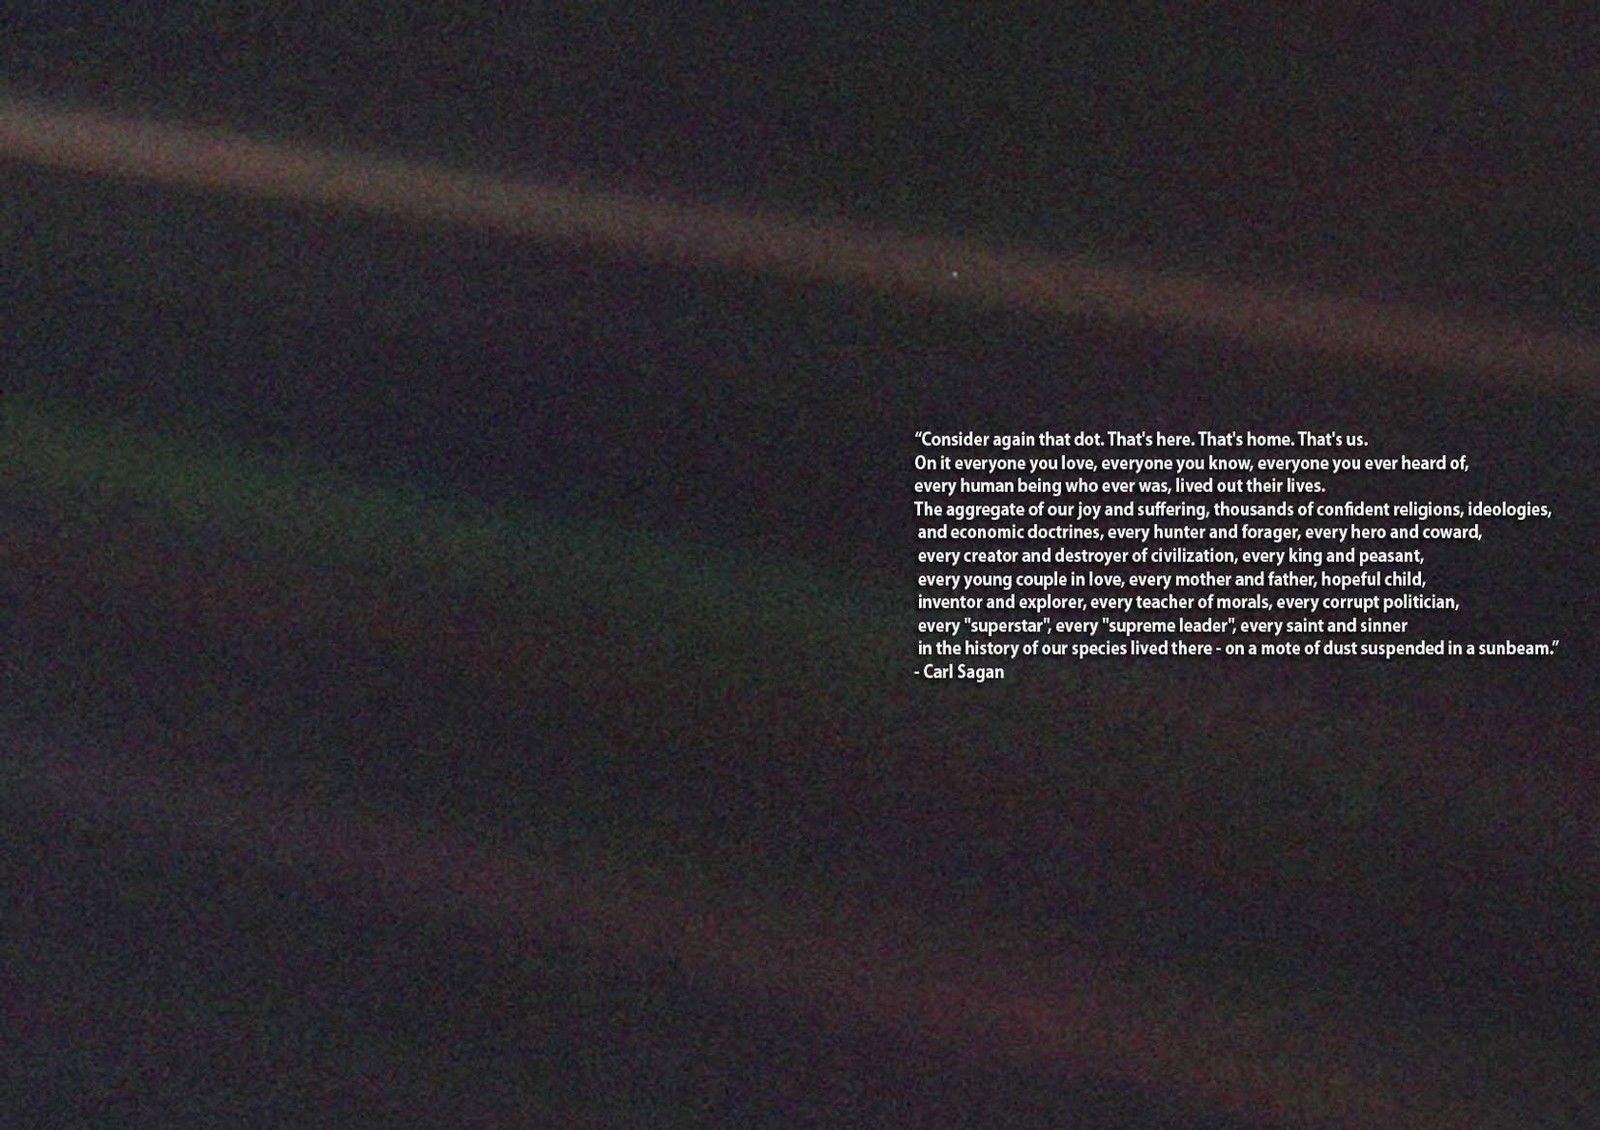 2019 Carl Sagan Pale Blue Dot Quote Space Art Silk Print